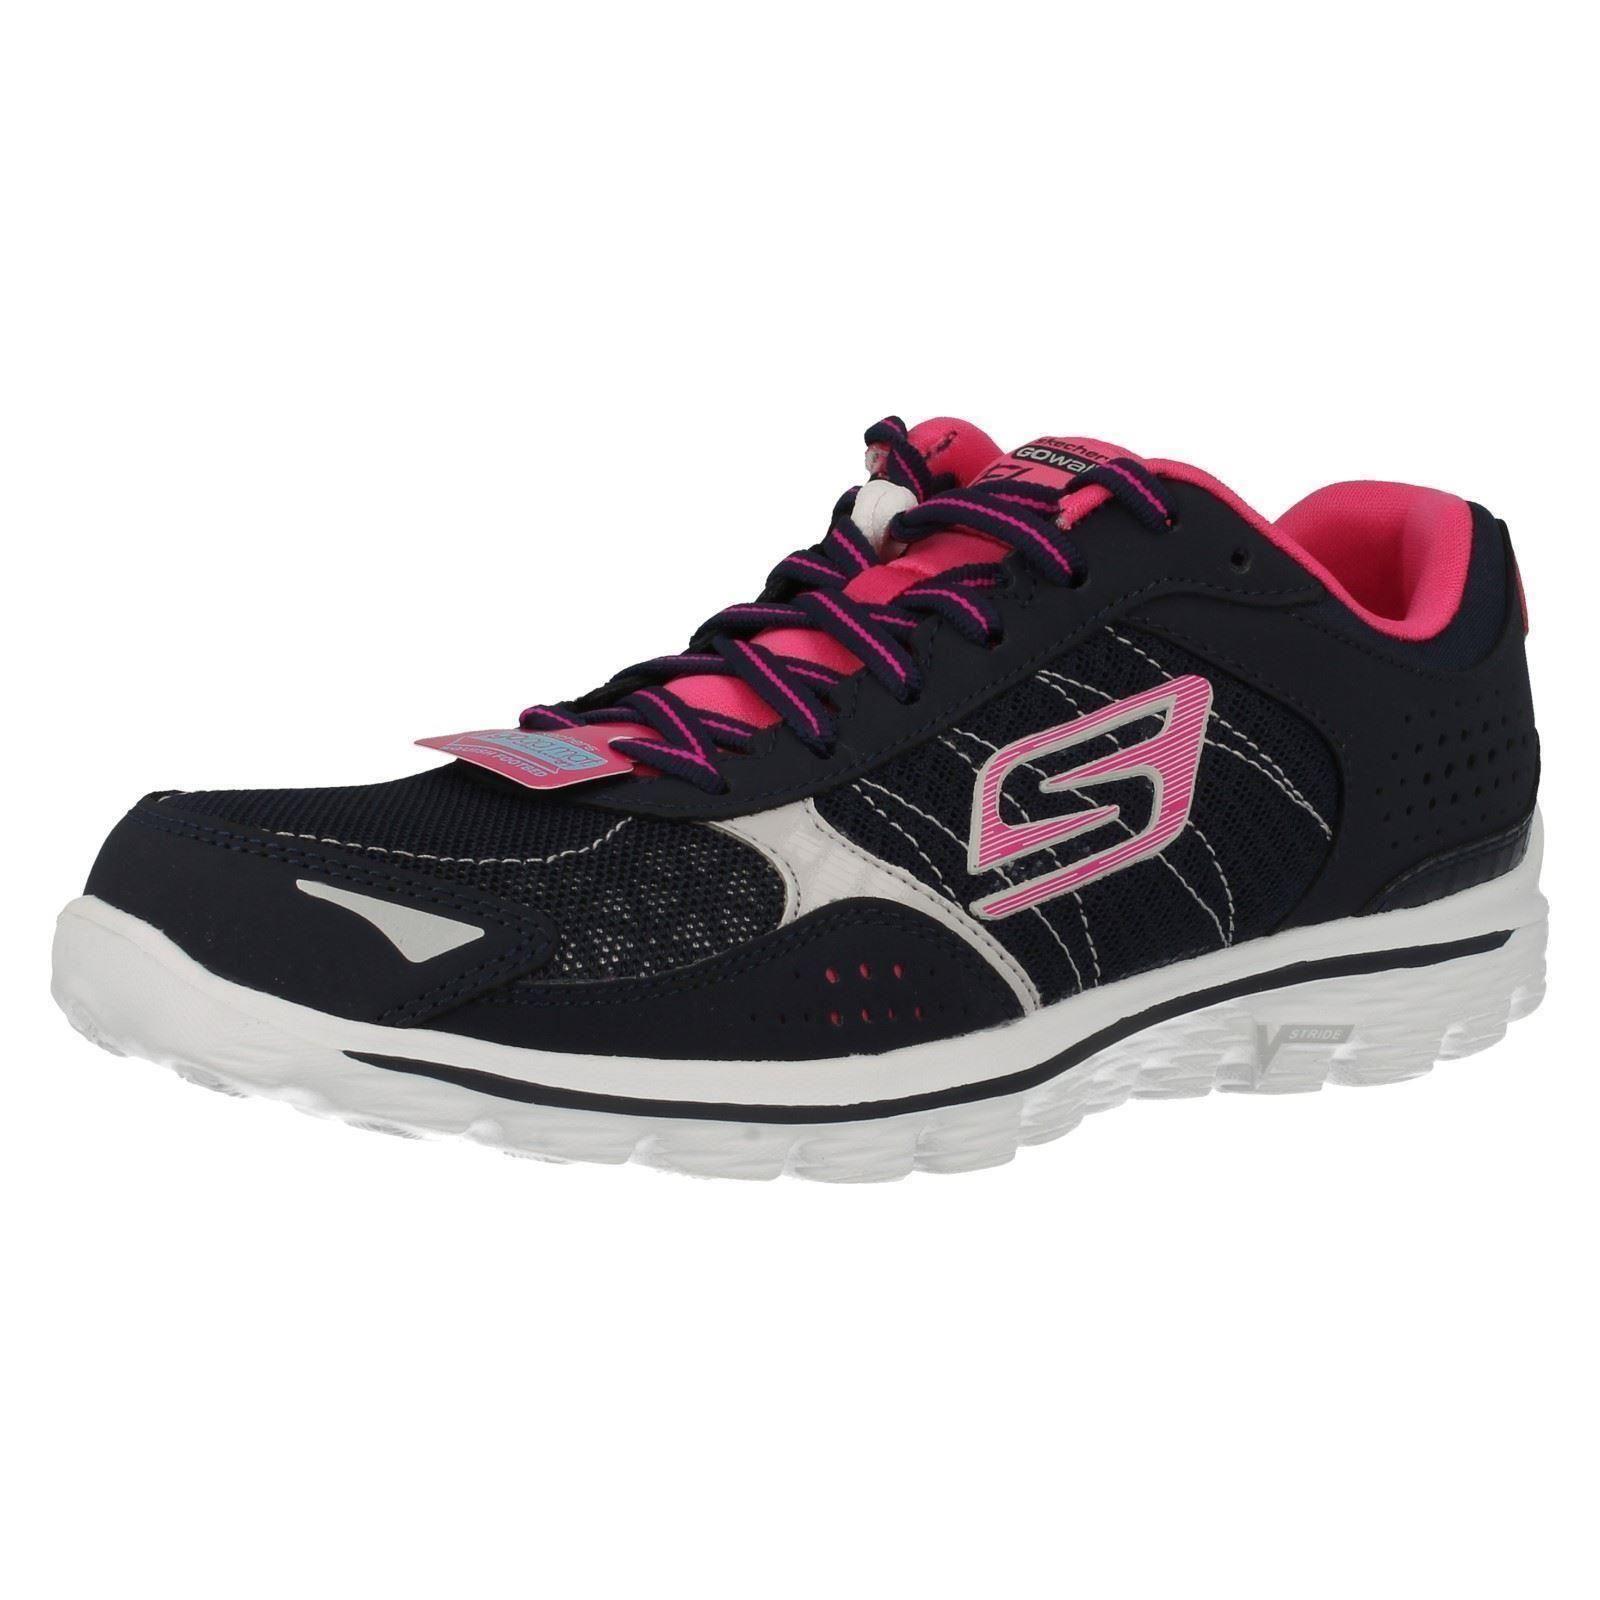 Skechers Ladies Go Walk 2 Trainers  Flash 13960   Trainers   2fea8f